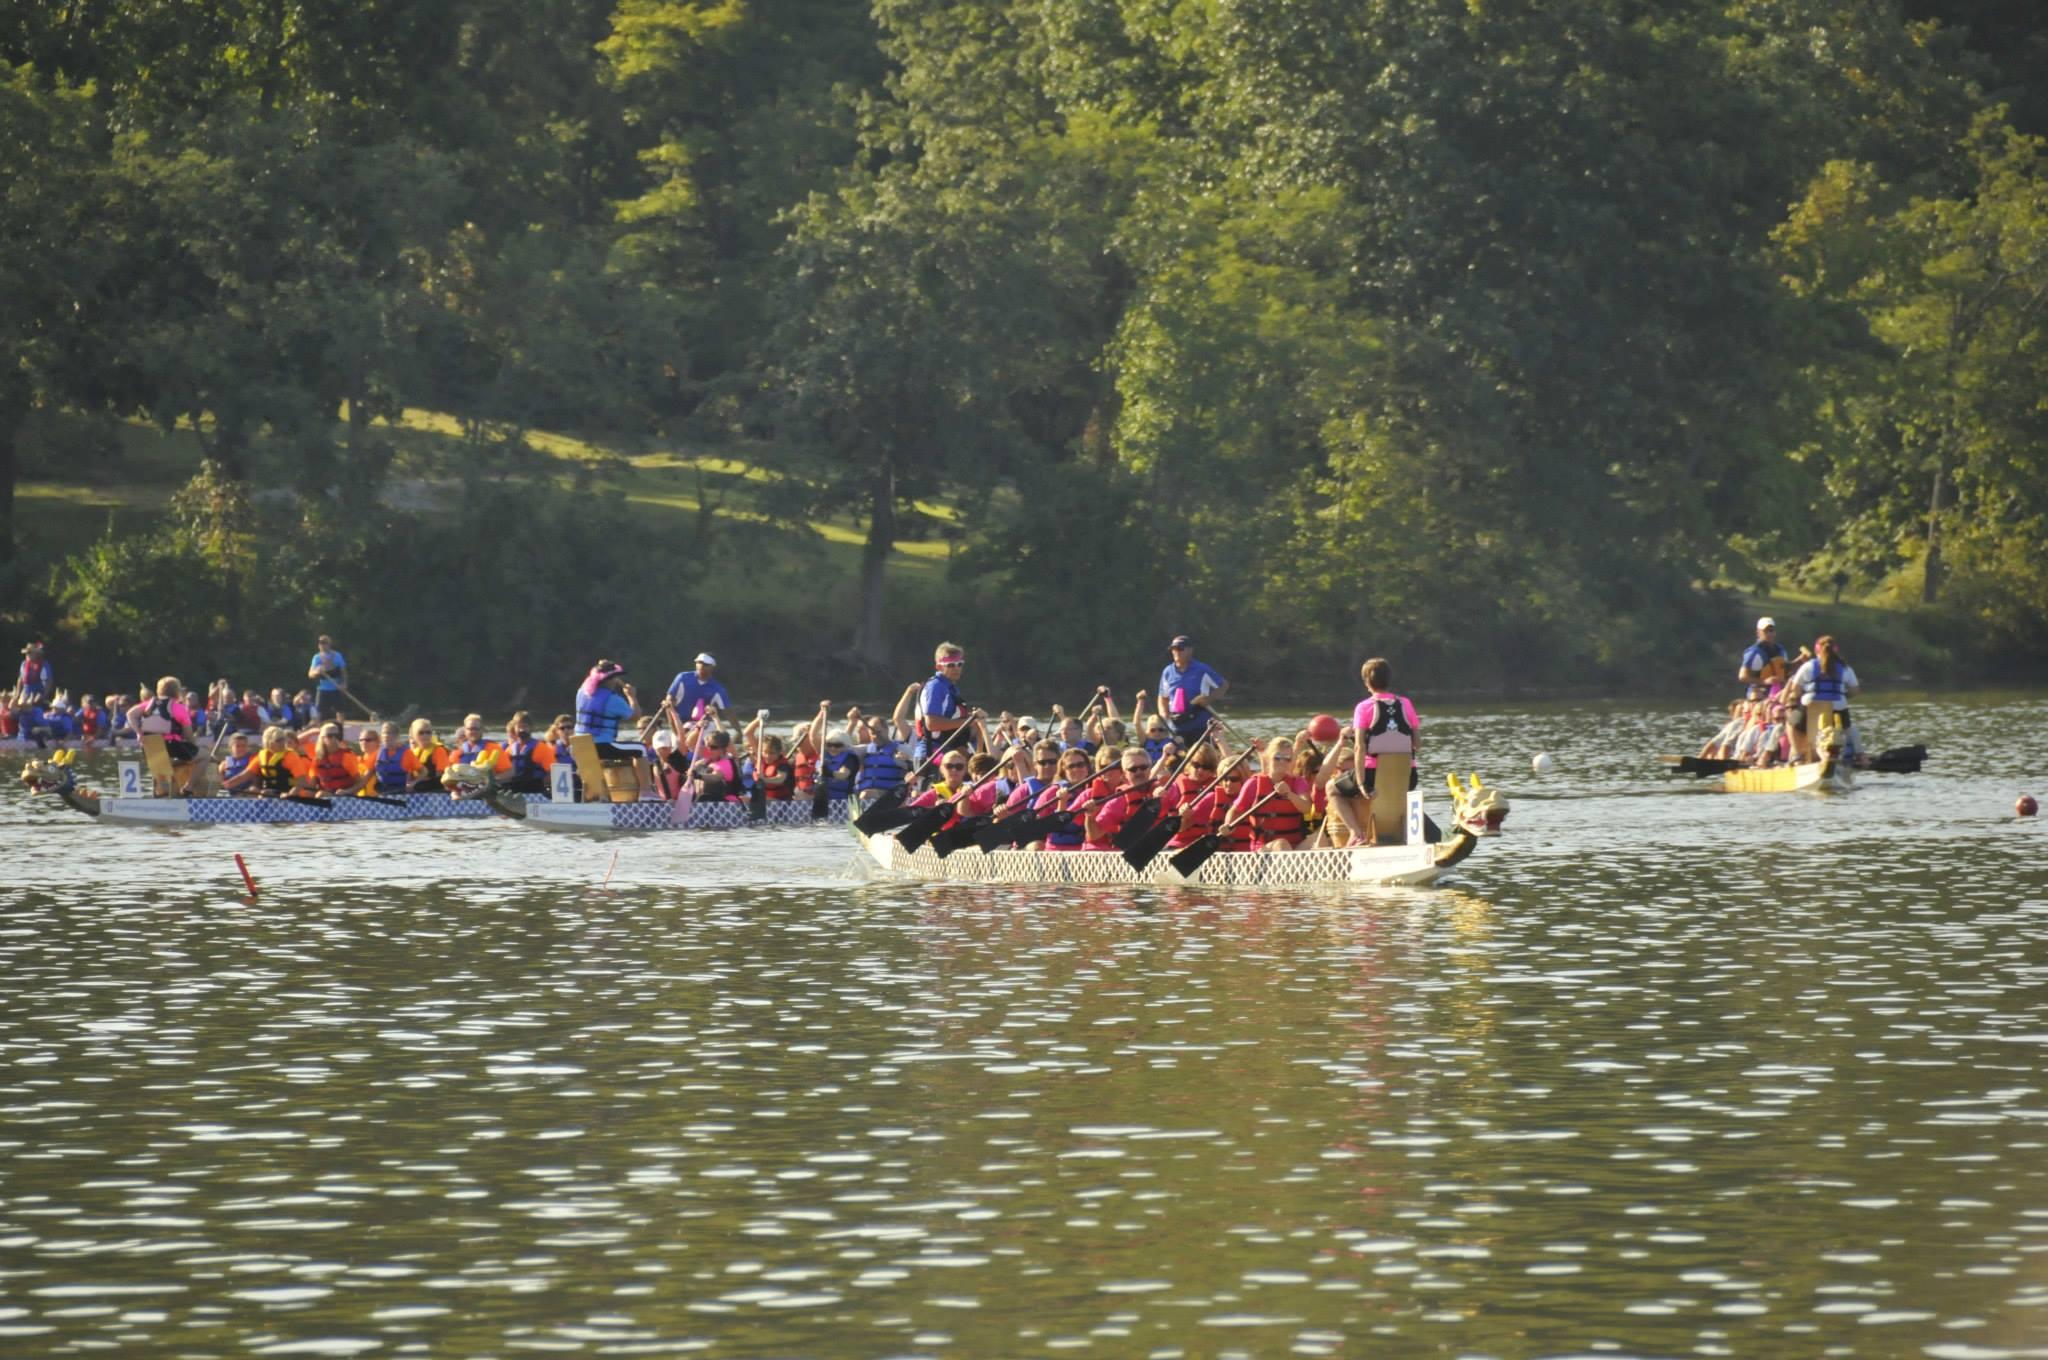 Kentucky Dragon Boat Festival - CANCELLED